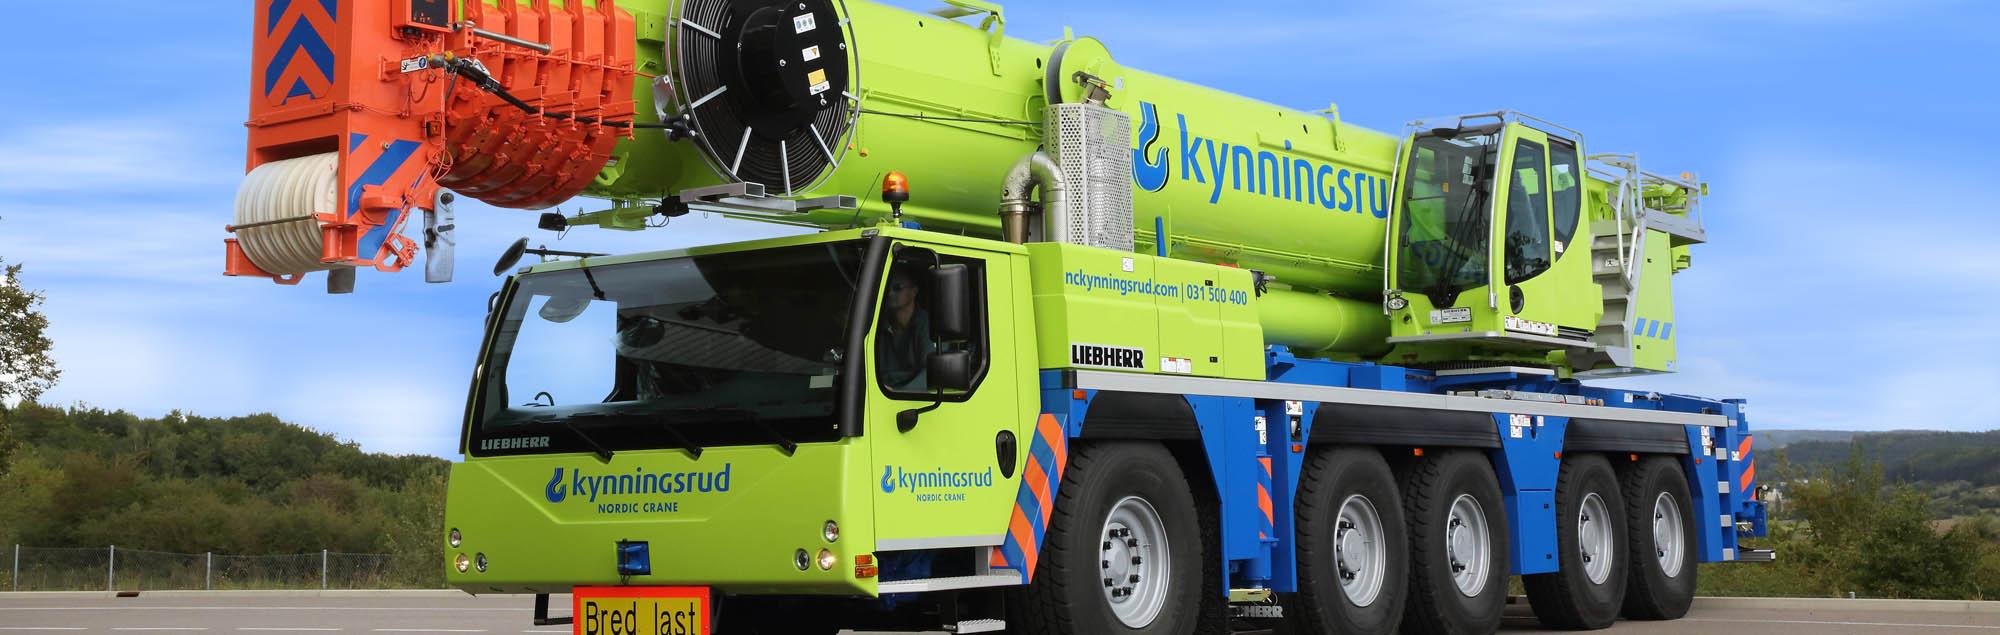 Acquires WBM Hyrkranar in Stockholm